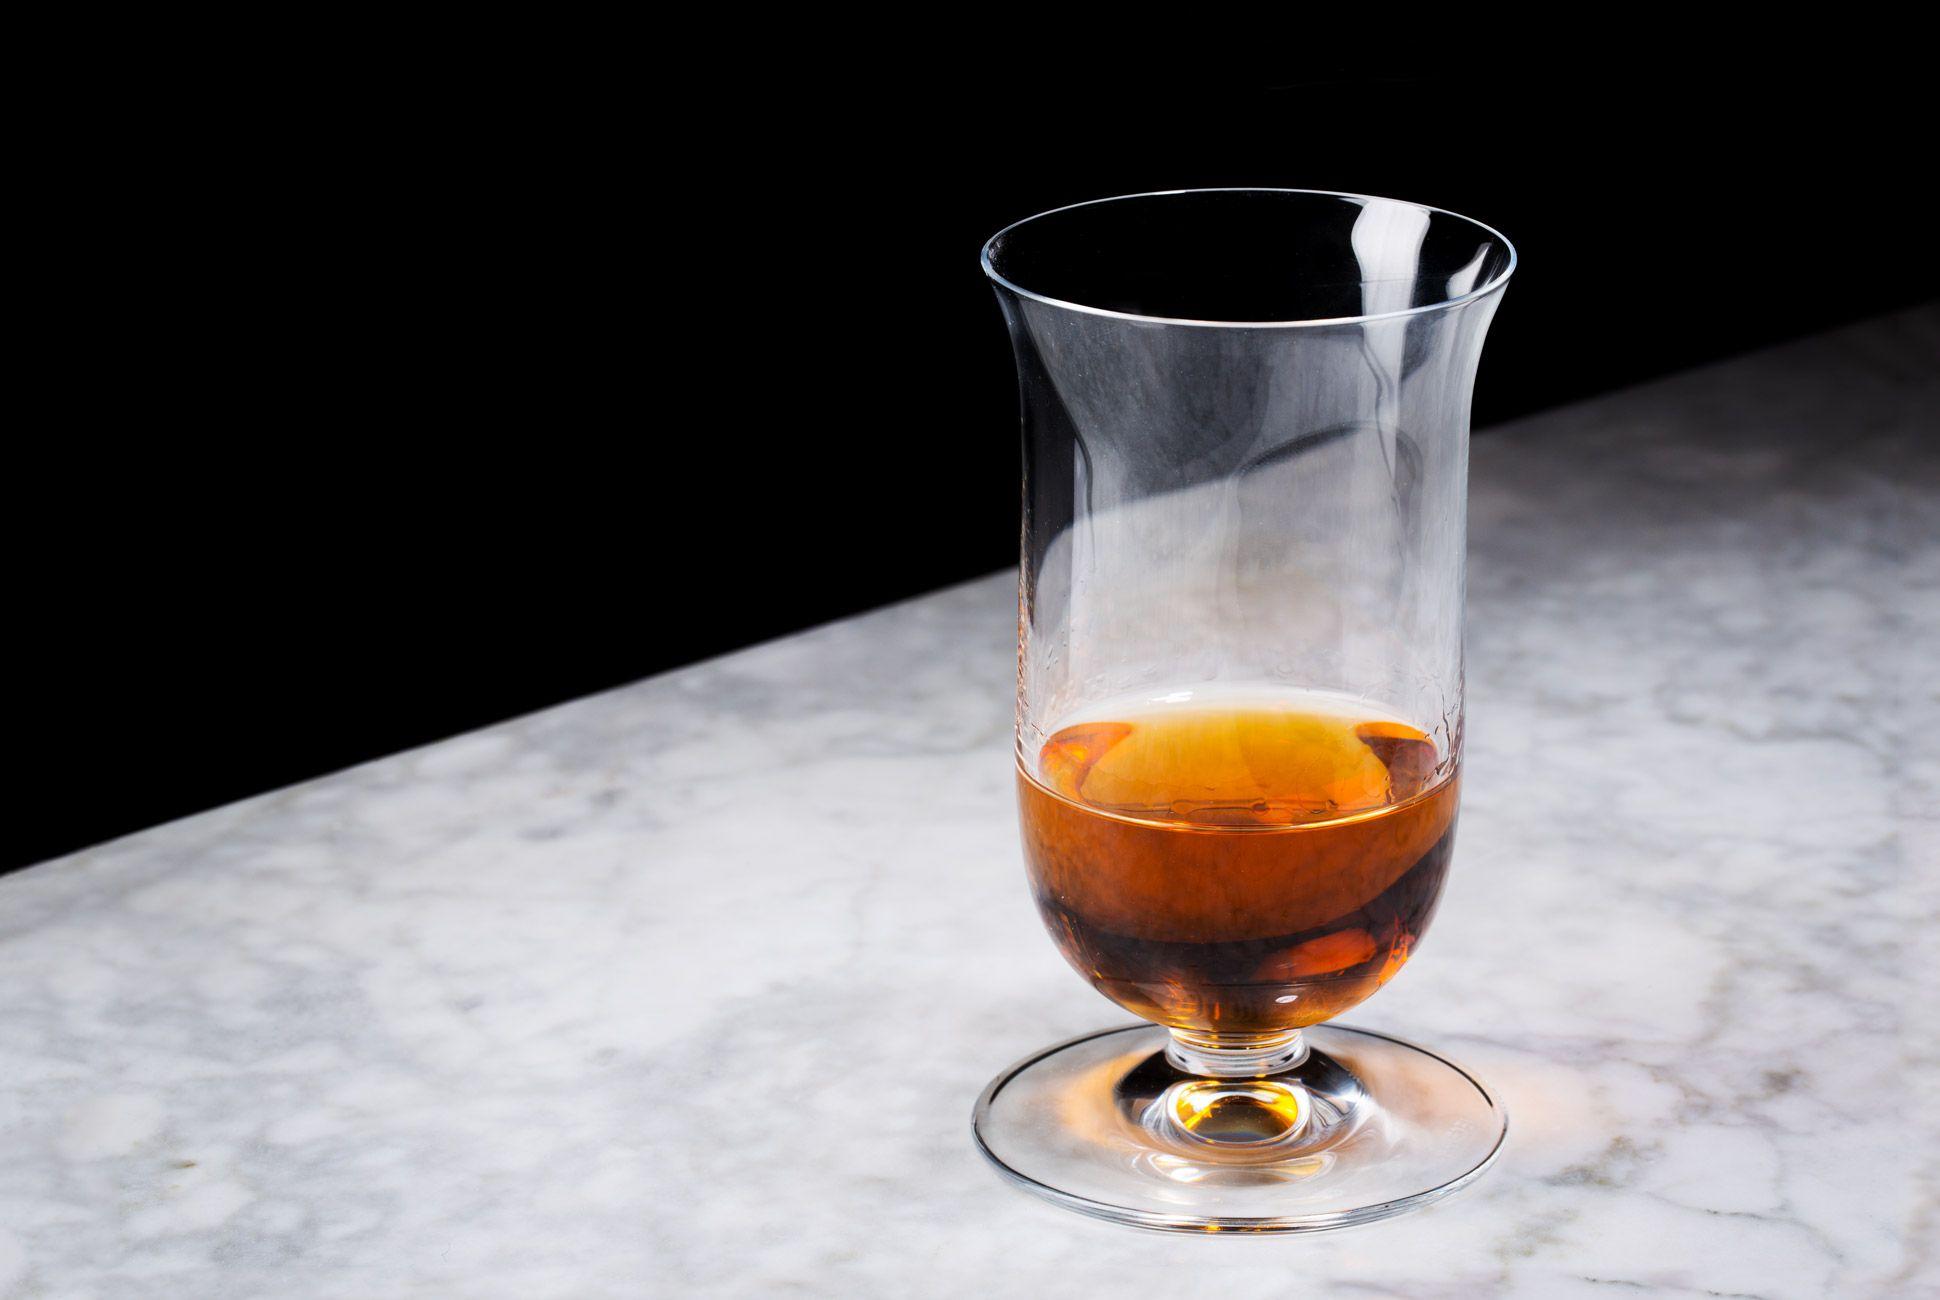 Whisky-Glasses-Gear-Patrol-Reidel